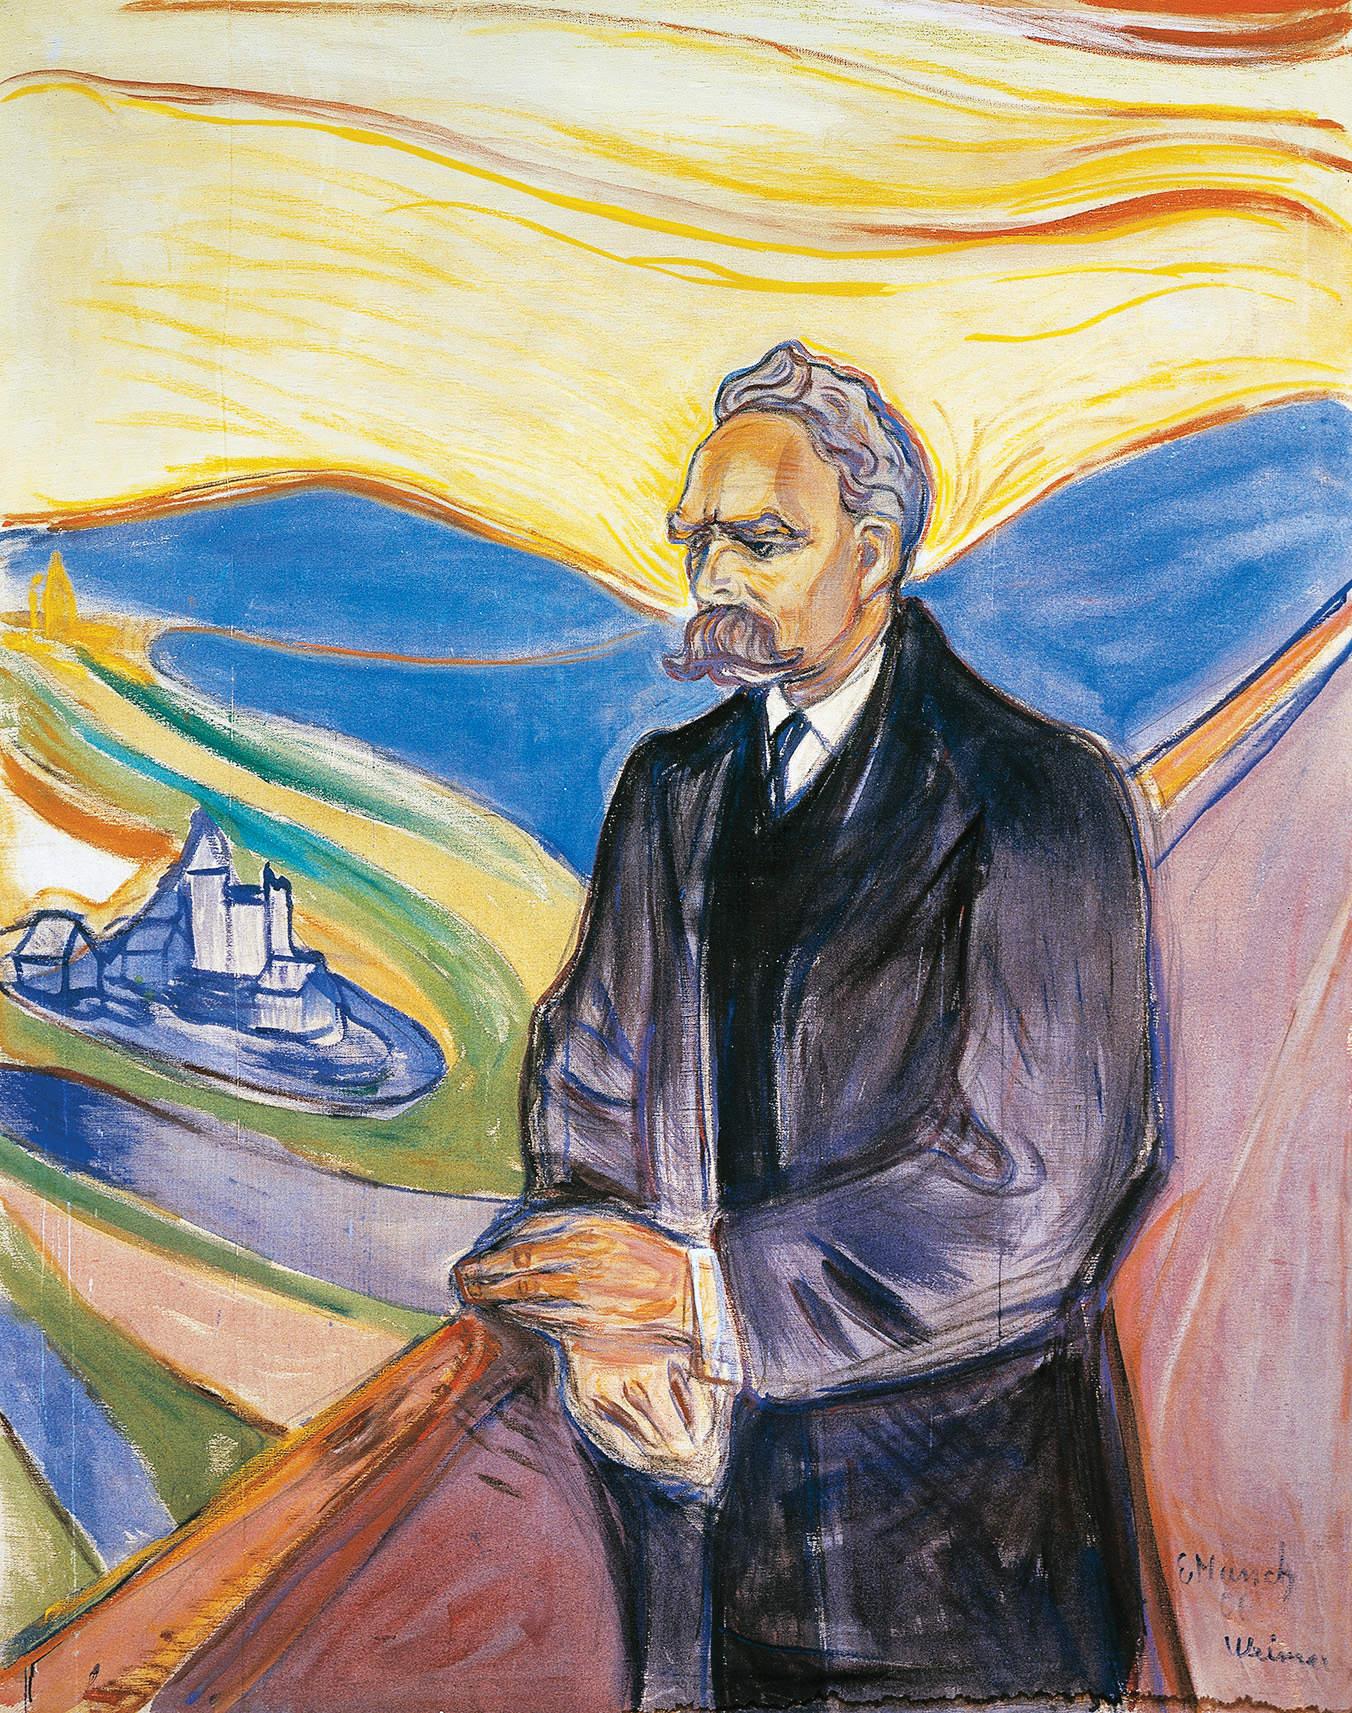 Friedrich Nietzsche, the conqueror with the iron hand